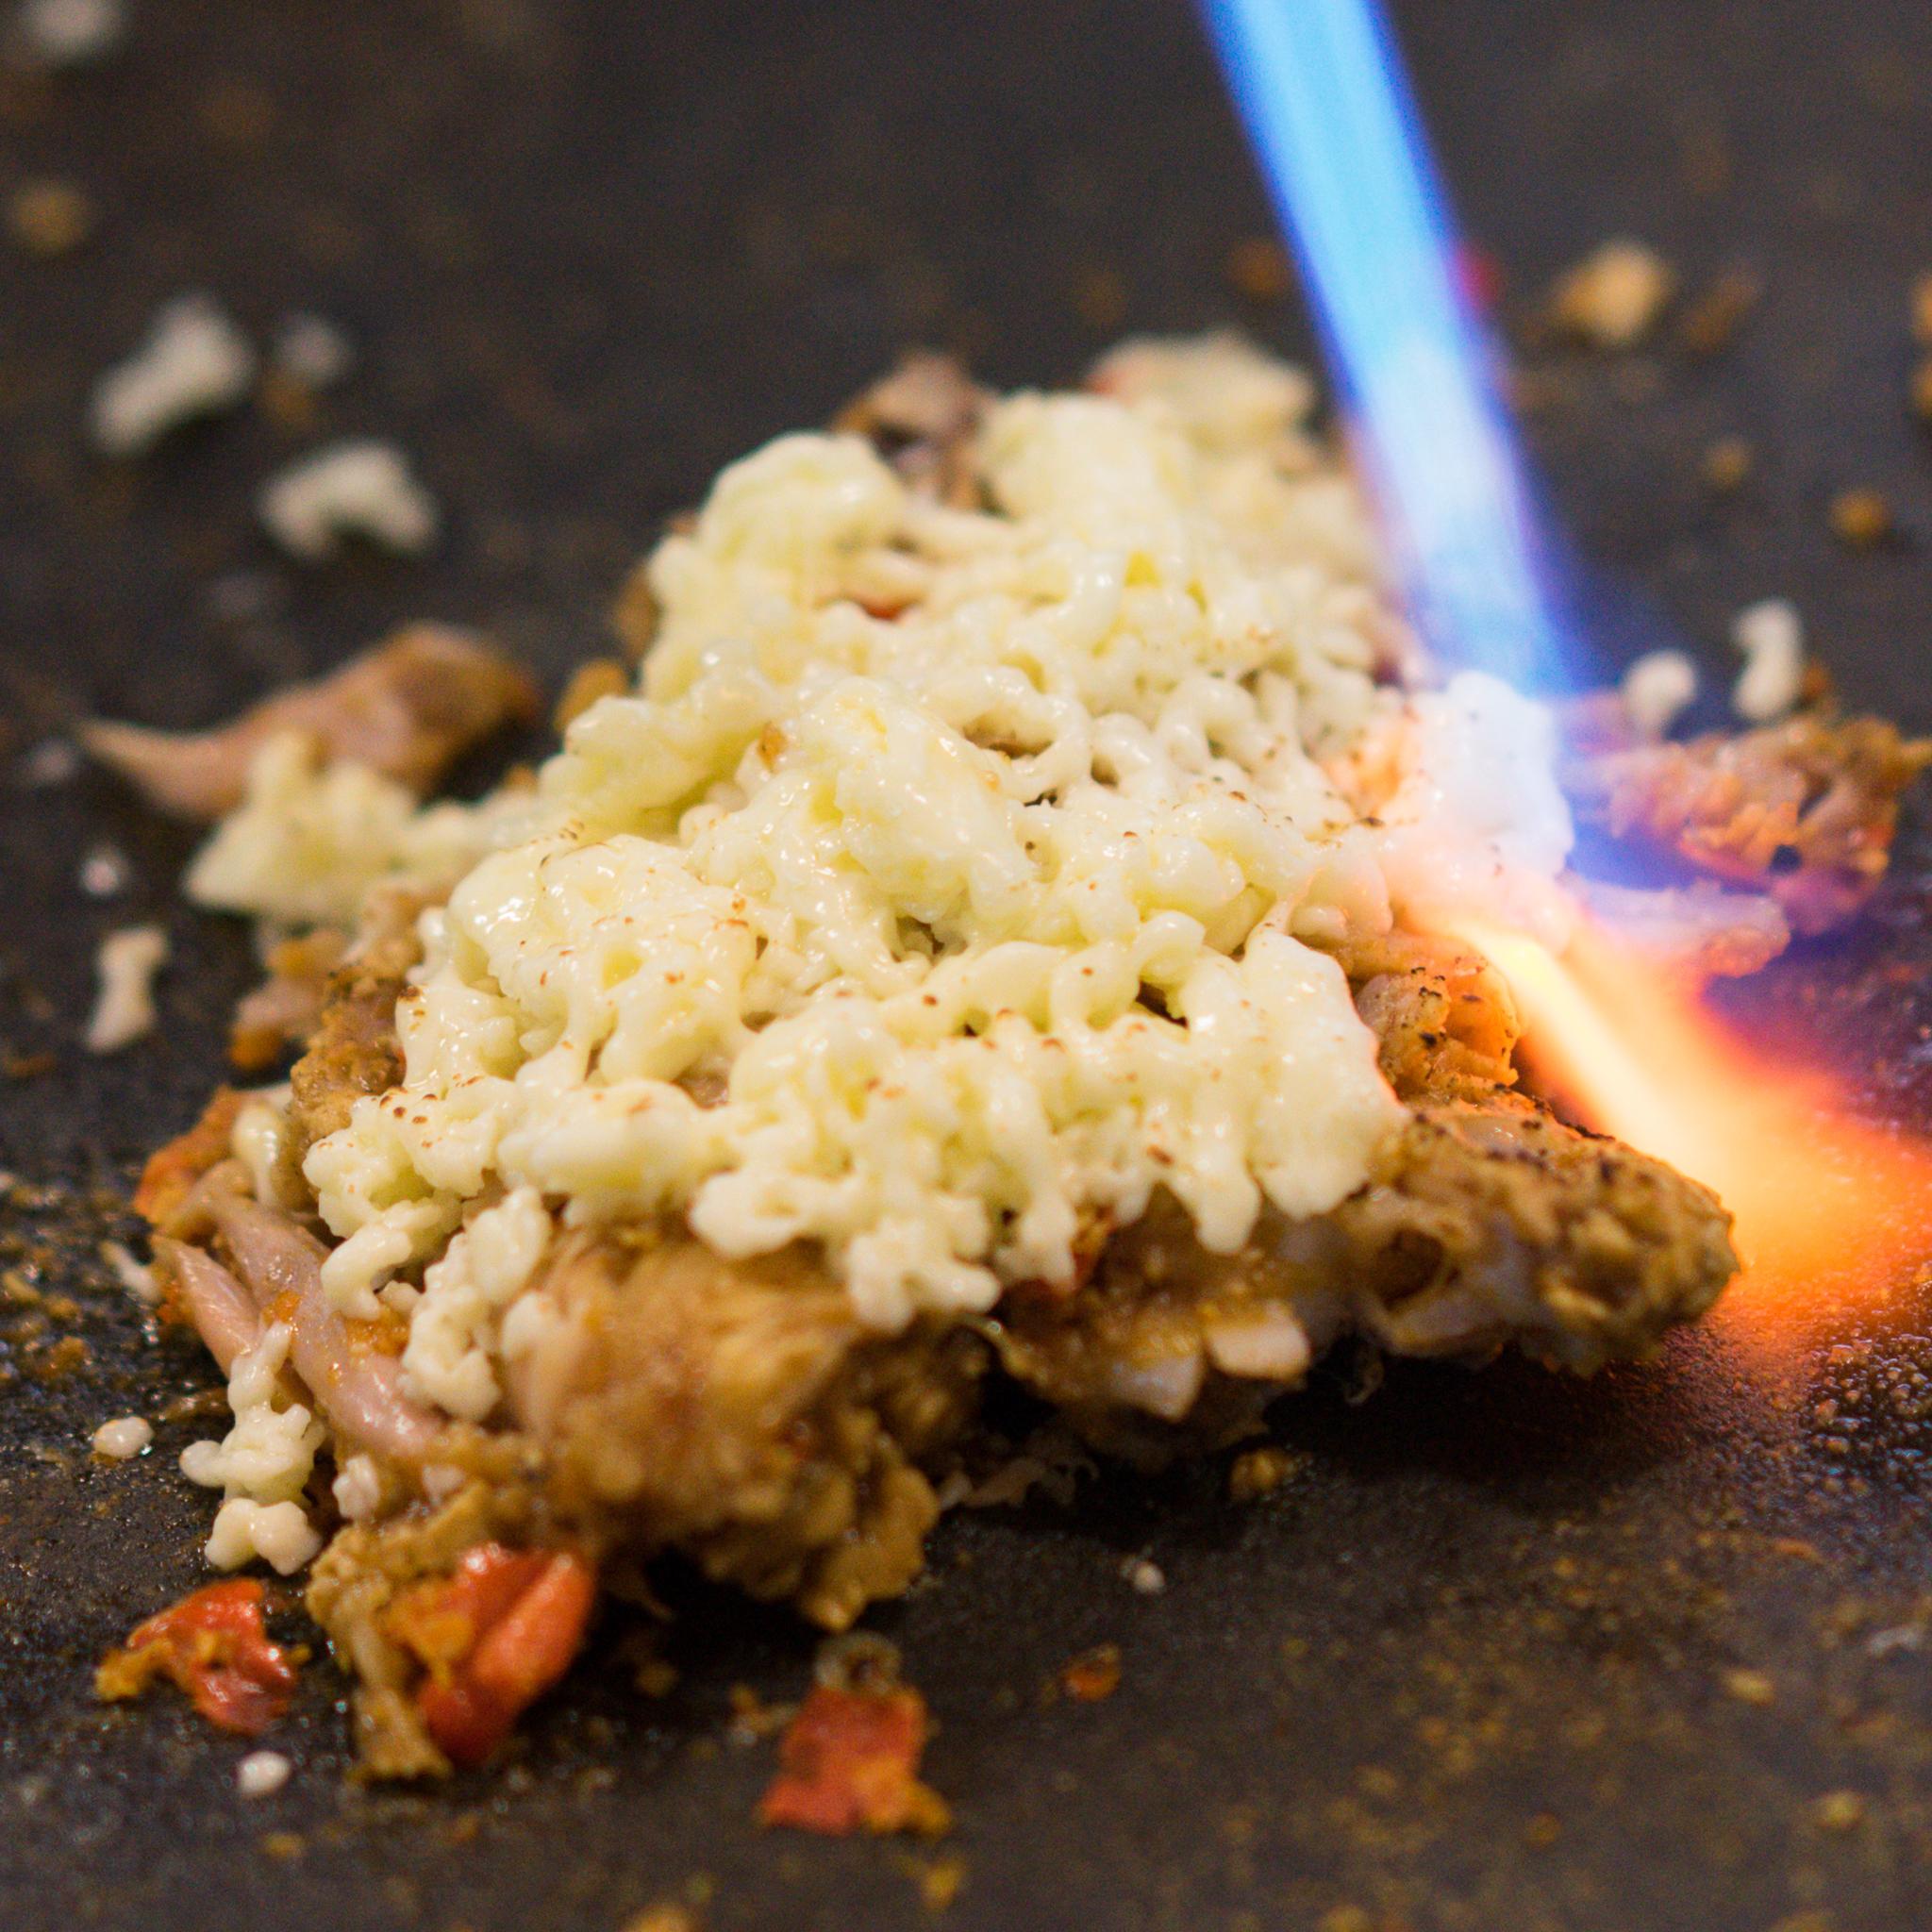 Kenalan dengan 7 Kuliner Malang yang Laris di GO-FOOD